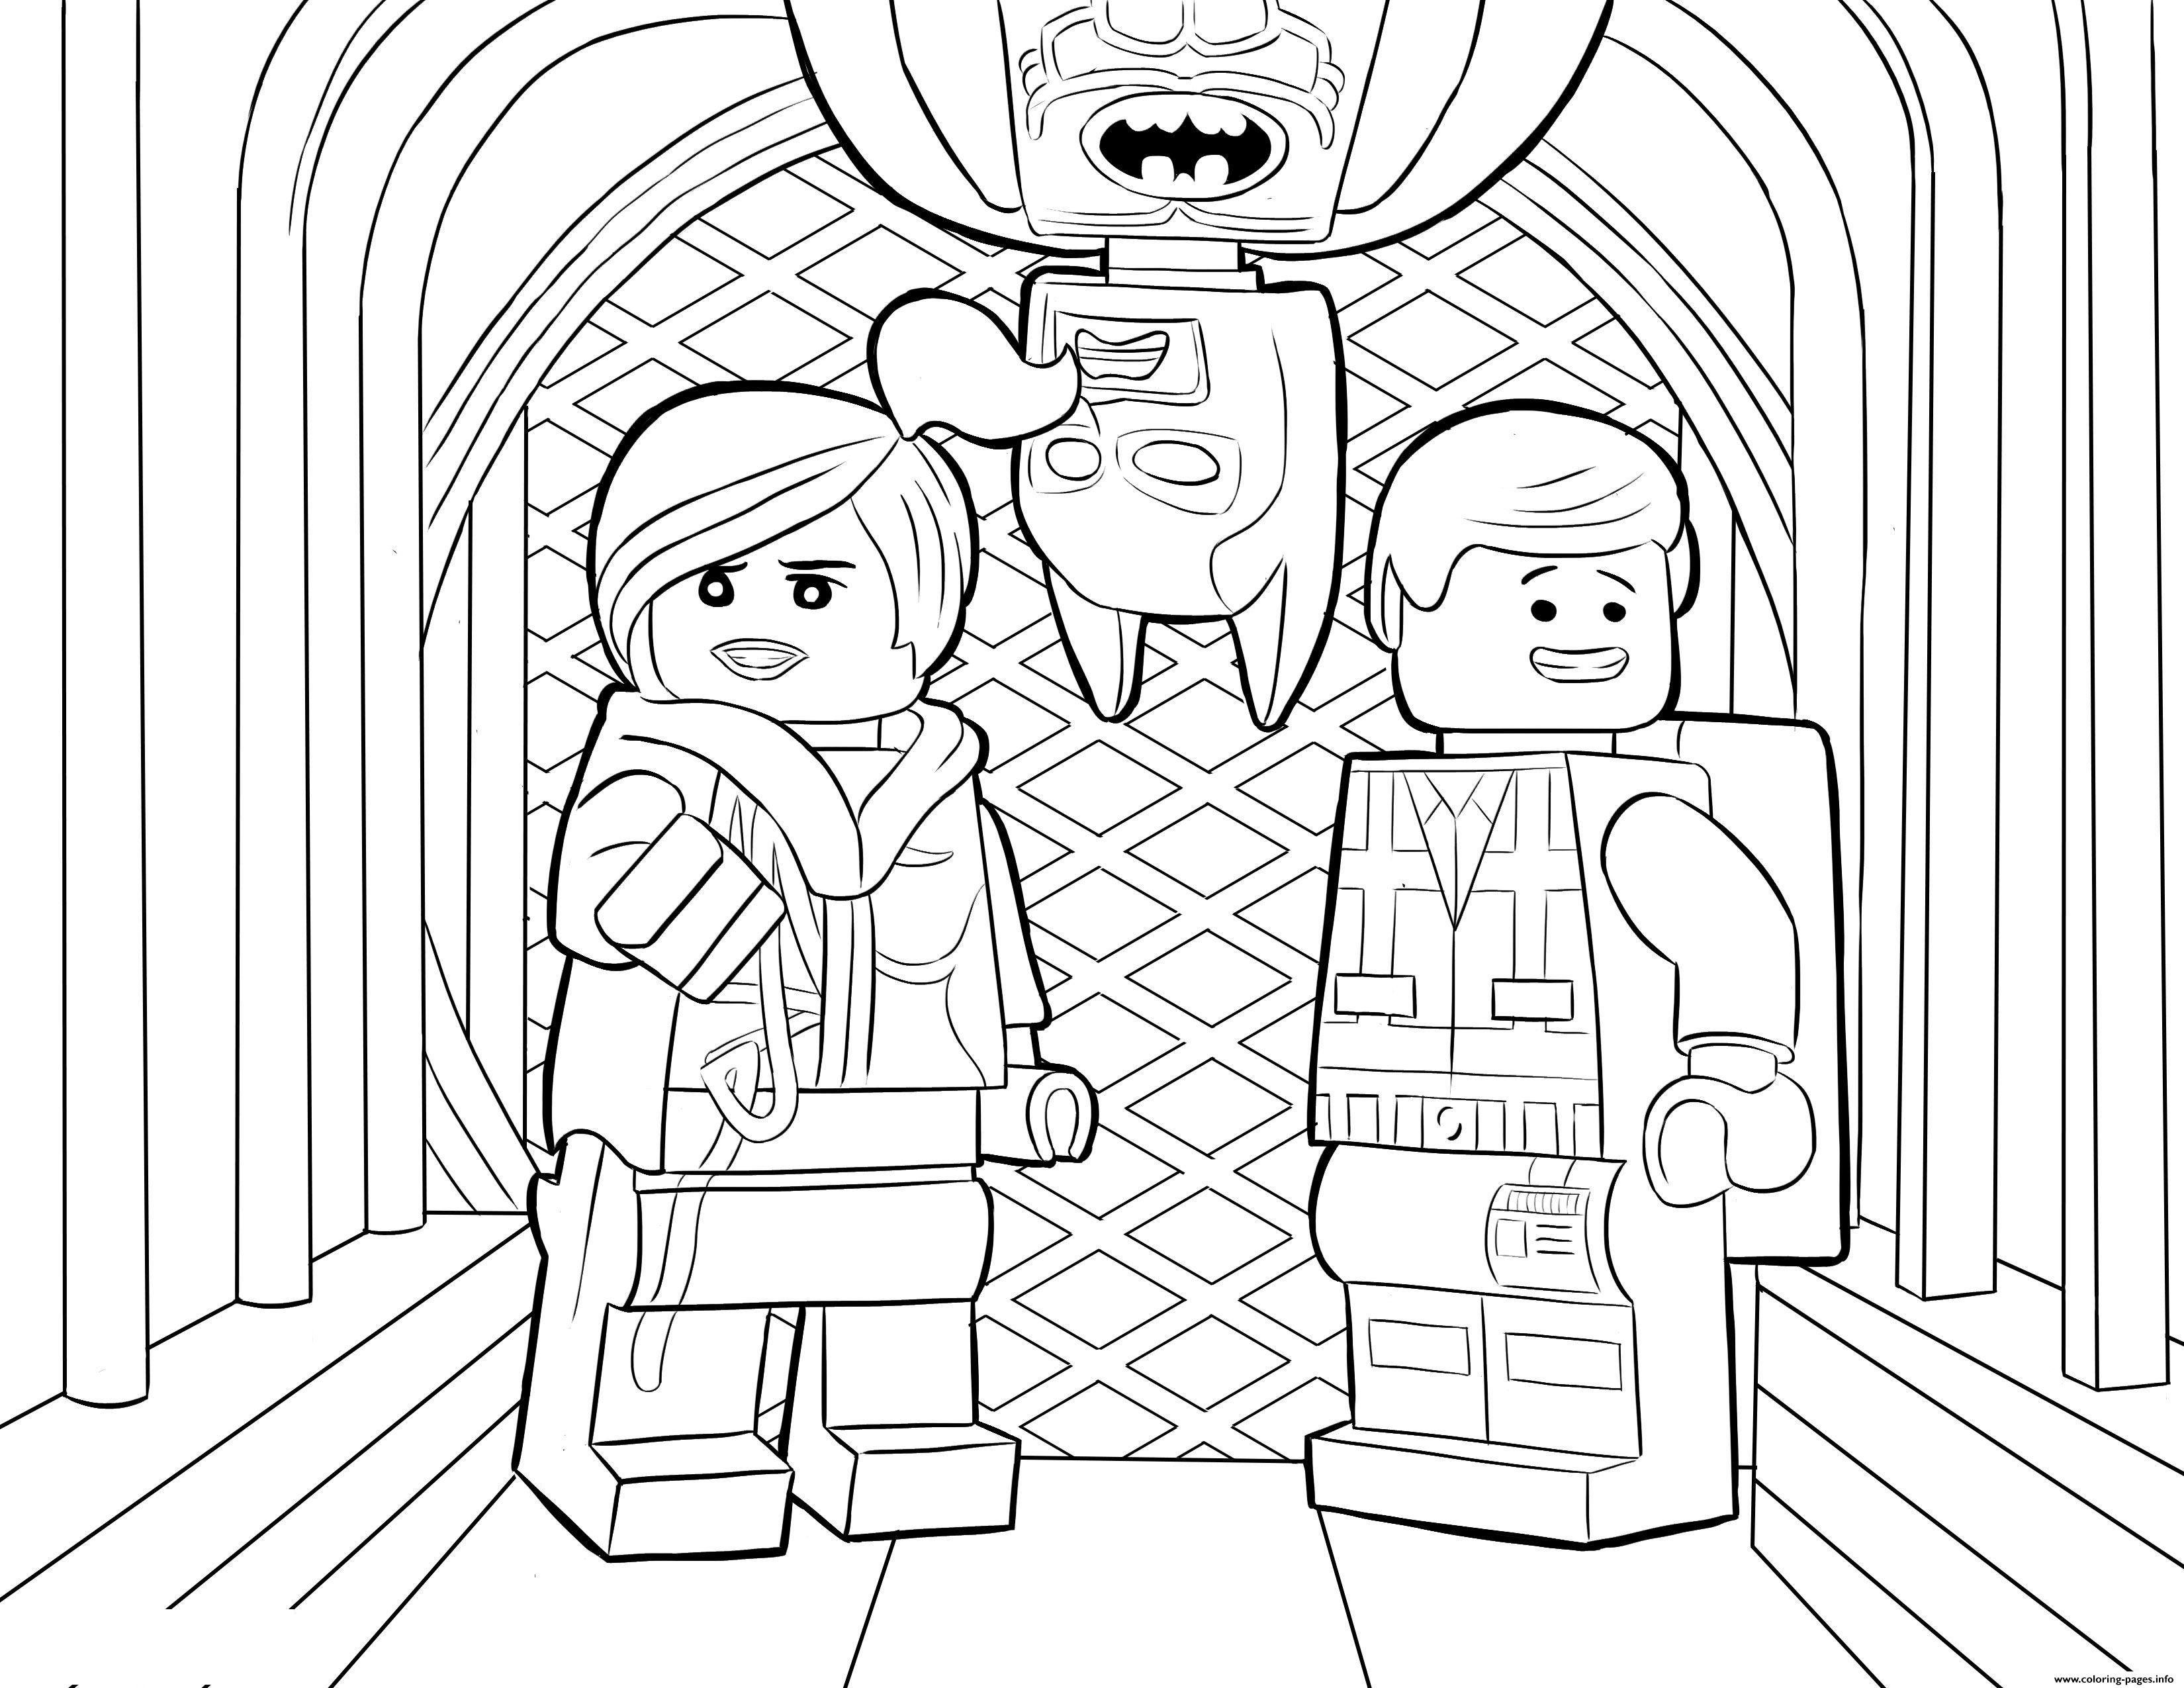 Print lego batman sheet coloring pages | Coloring pages | Pinterest